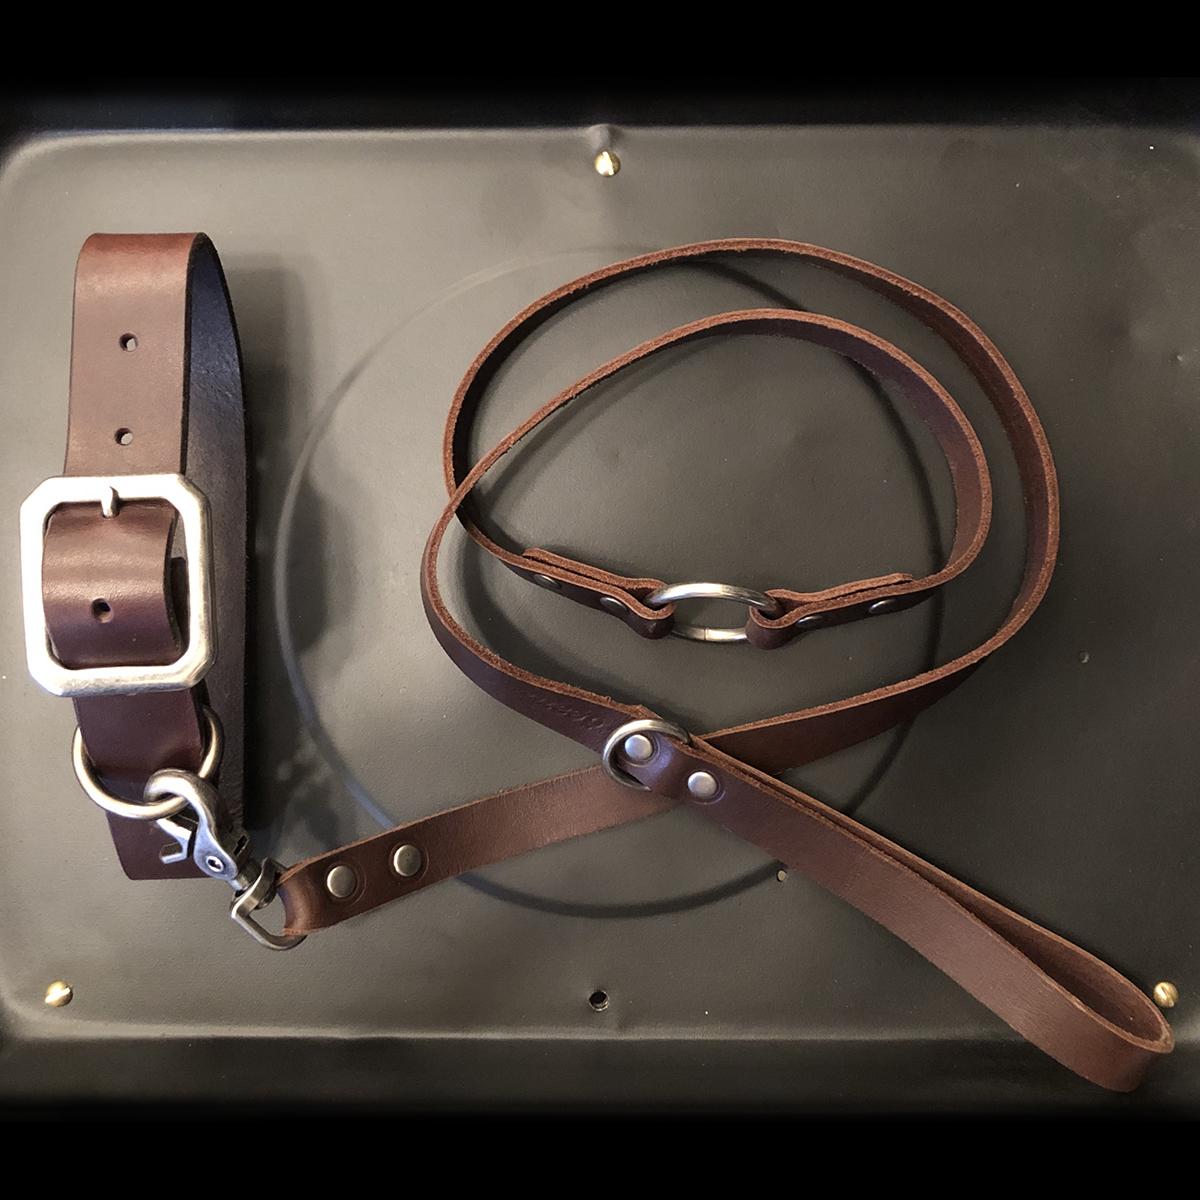 AIRMKT eCom PN XXXXXX Dean Accessories _collar leash brown WEB